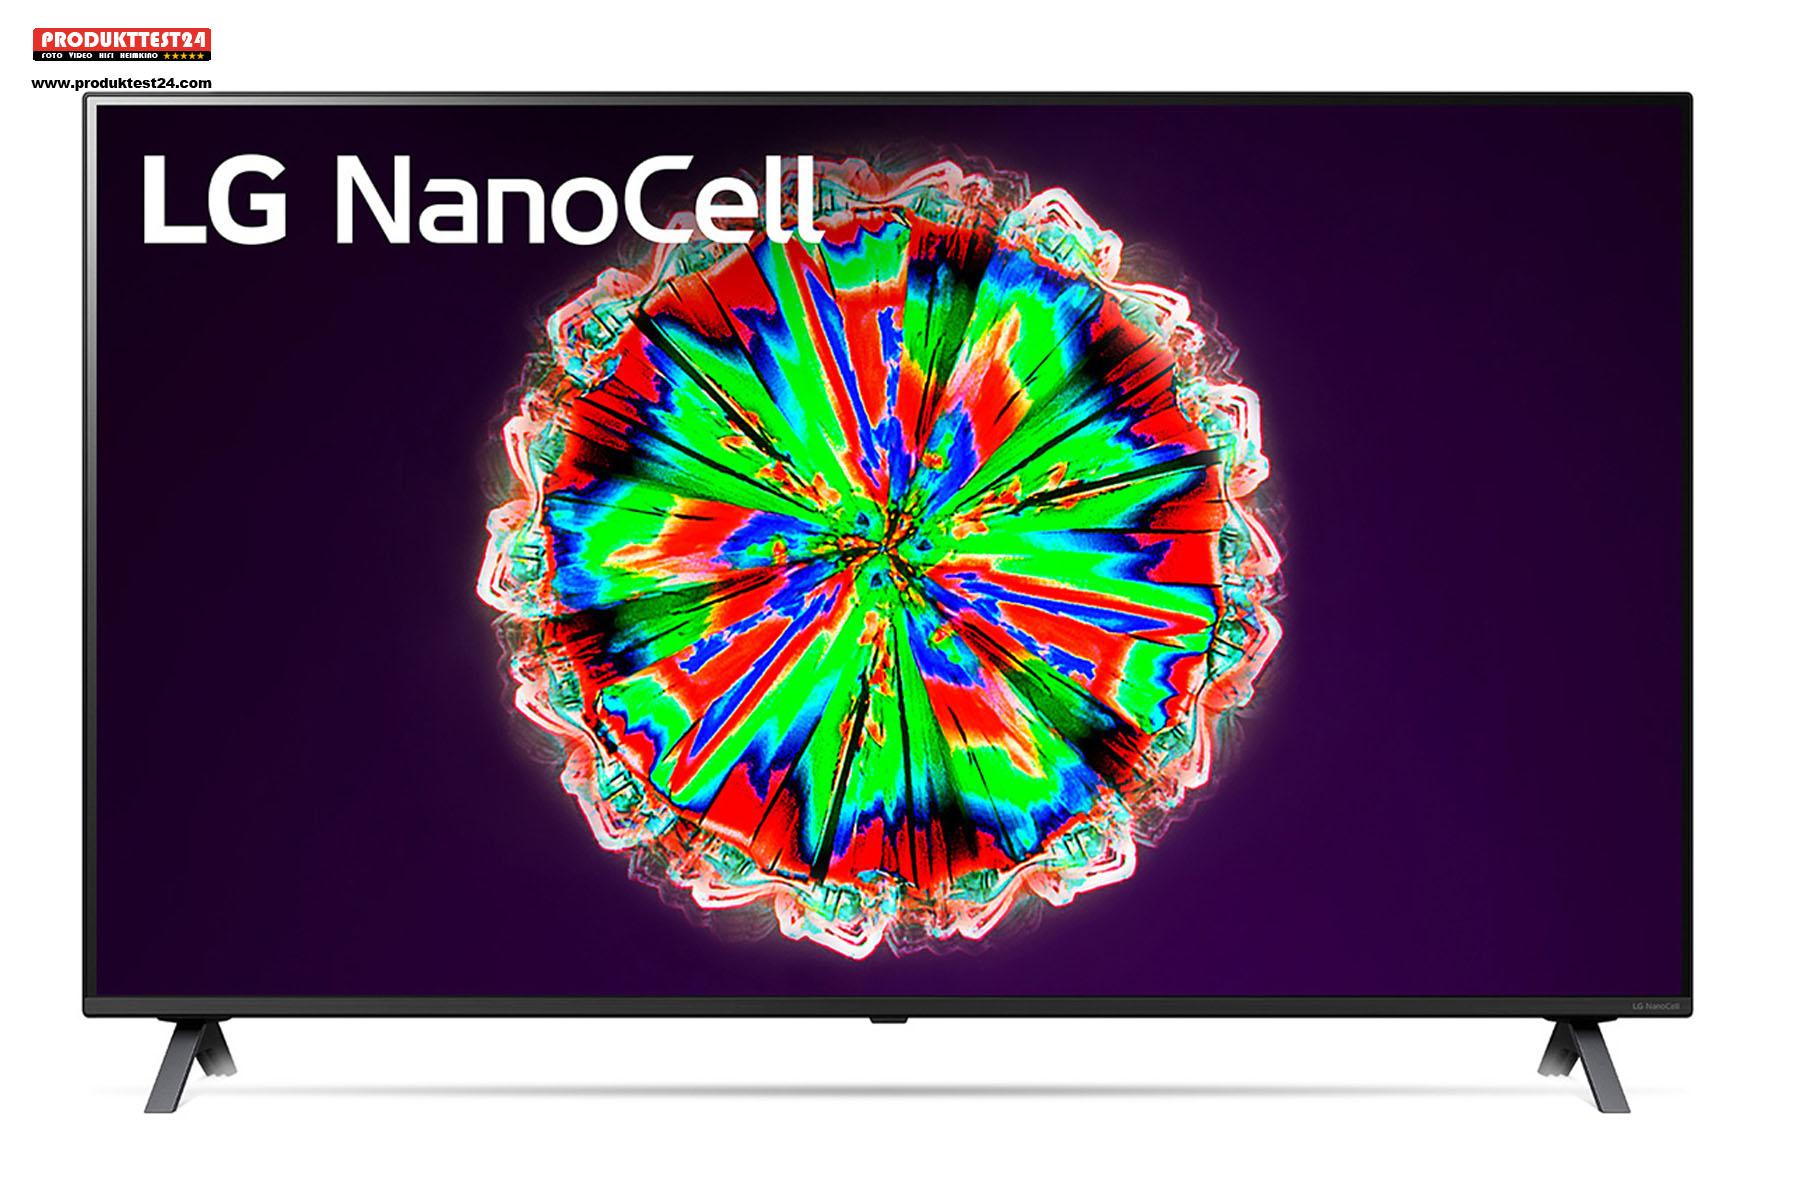 Der LG 49UN806NA Ultra HD Fernseher mit NanoCell Display